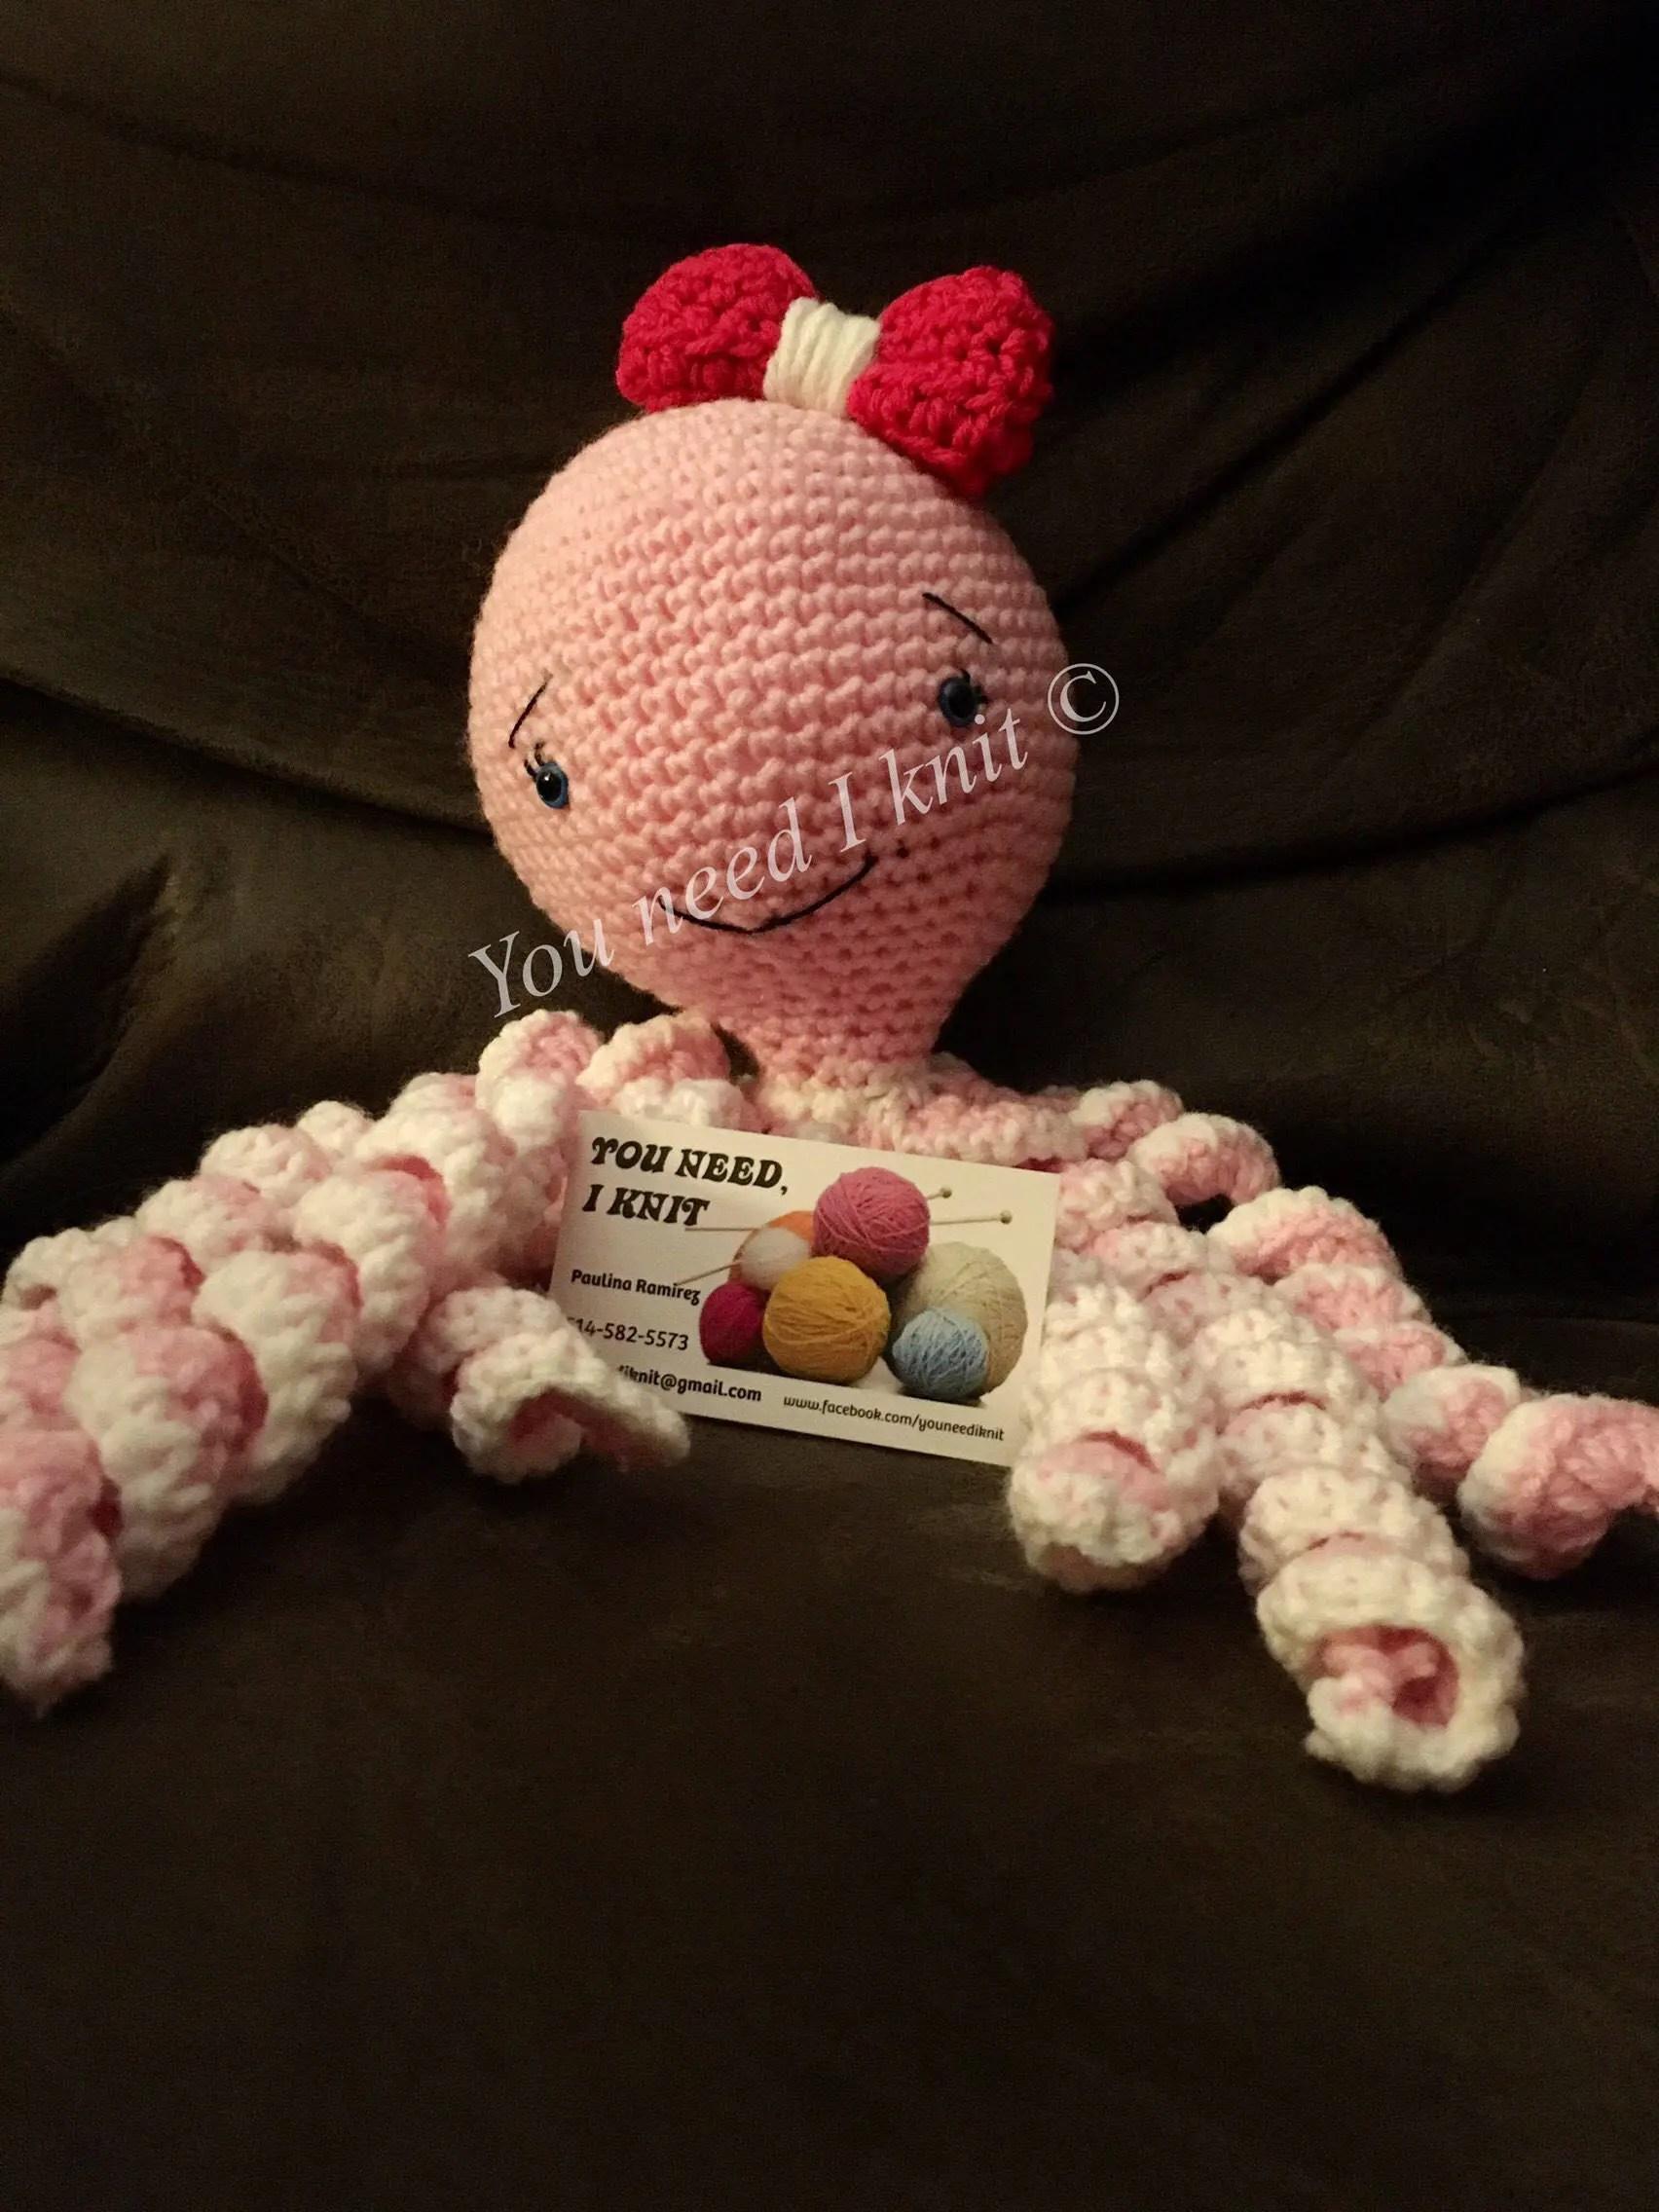 Premie octopus / Newborn ocotpus / baby preemie / crochet image 6